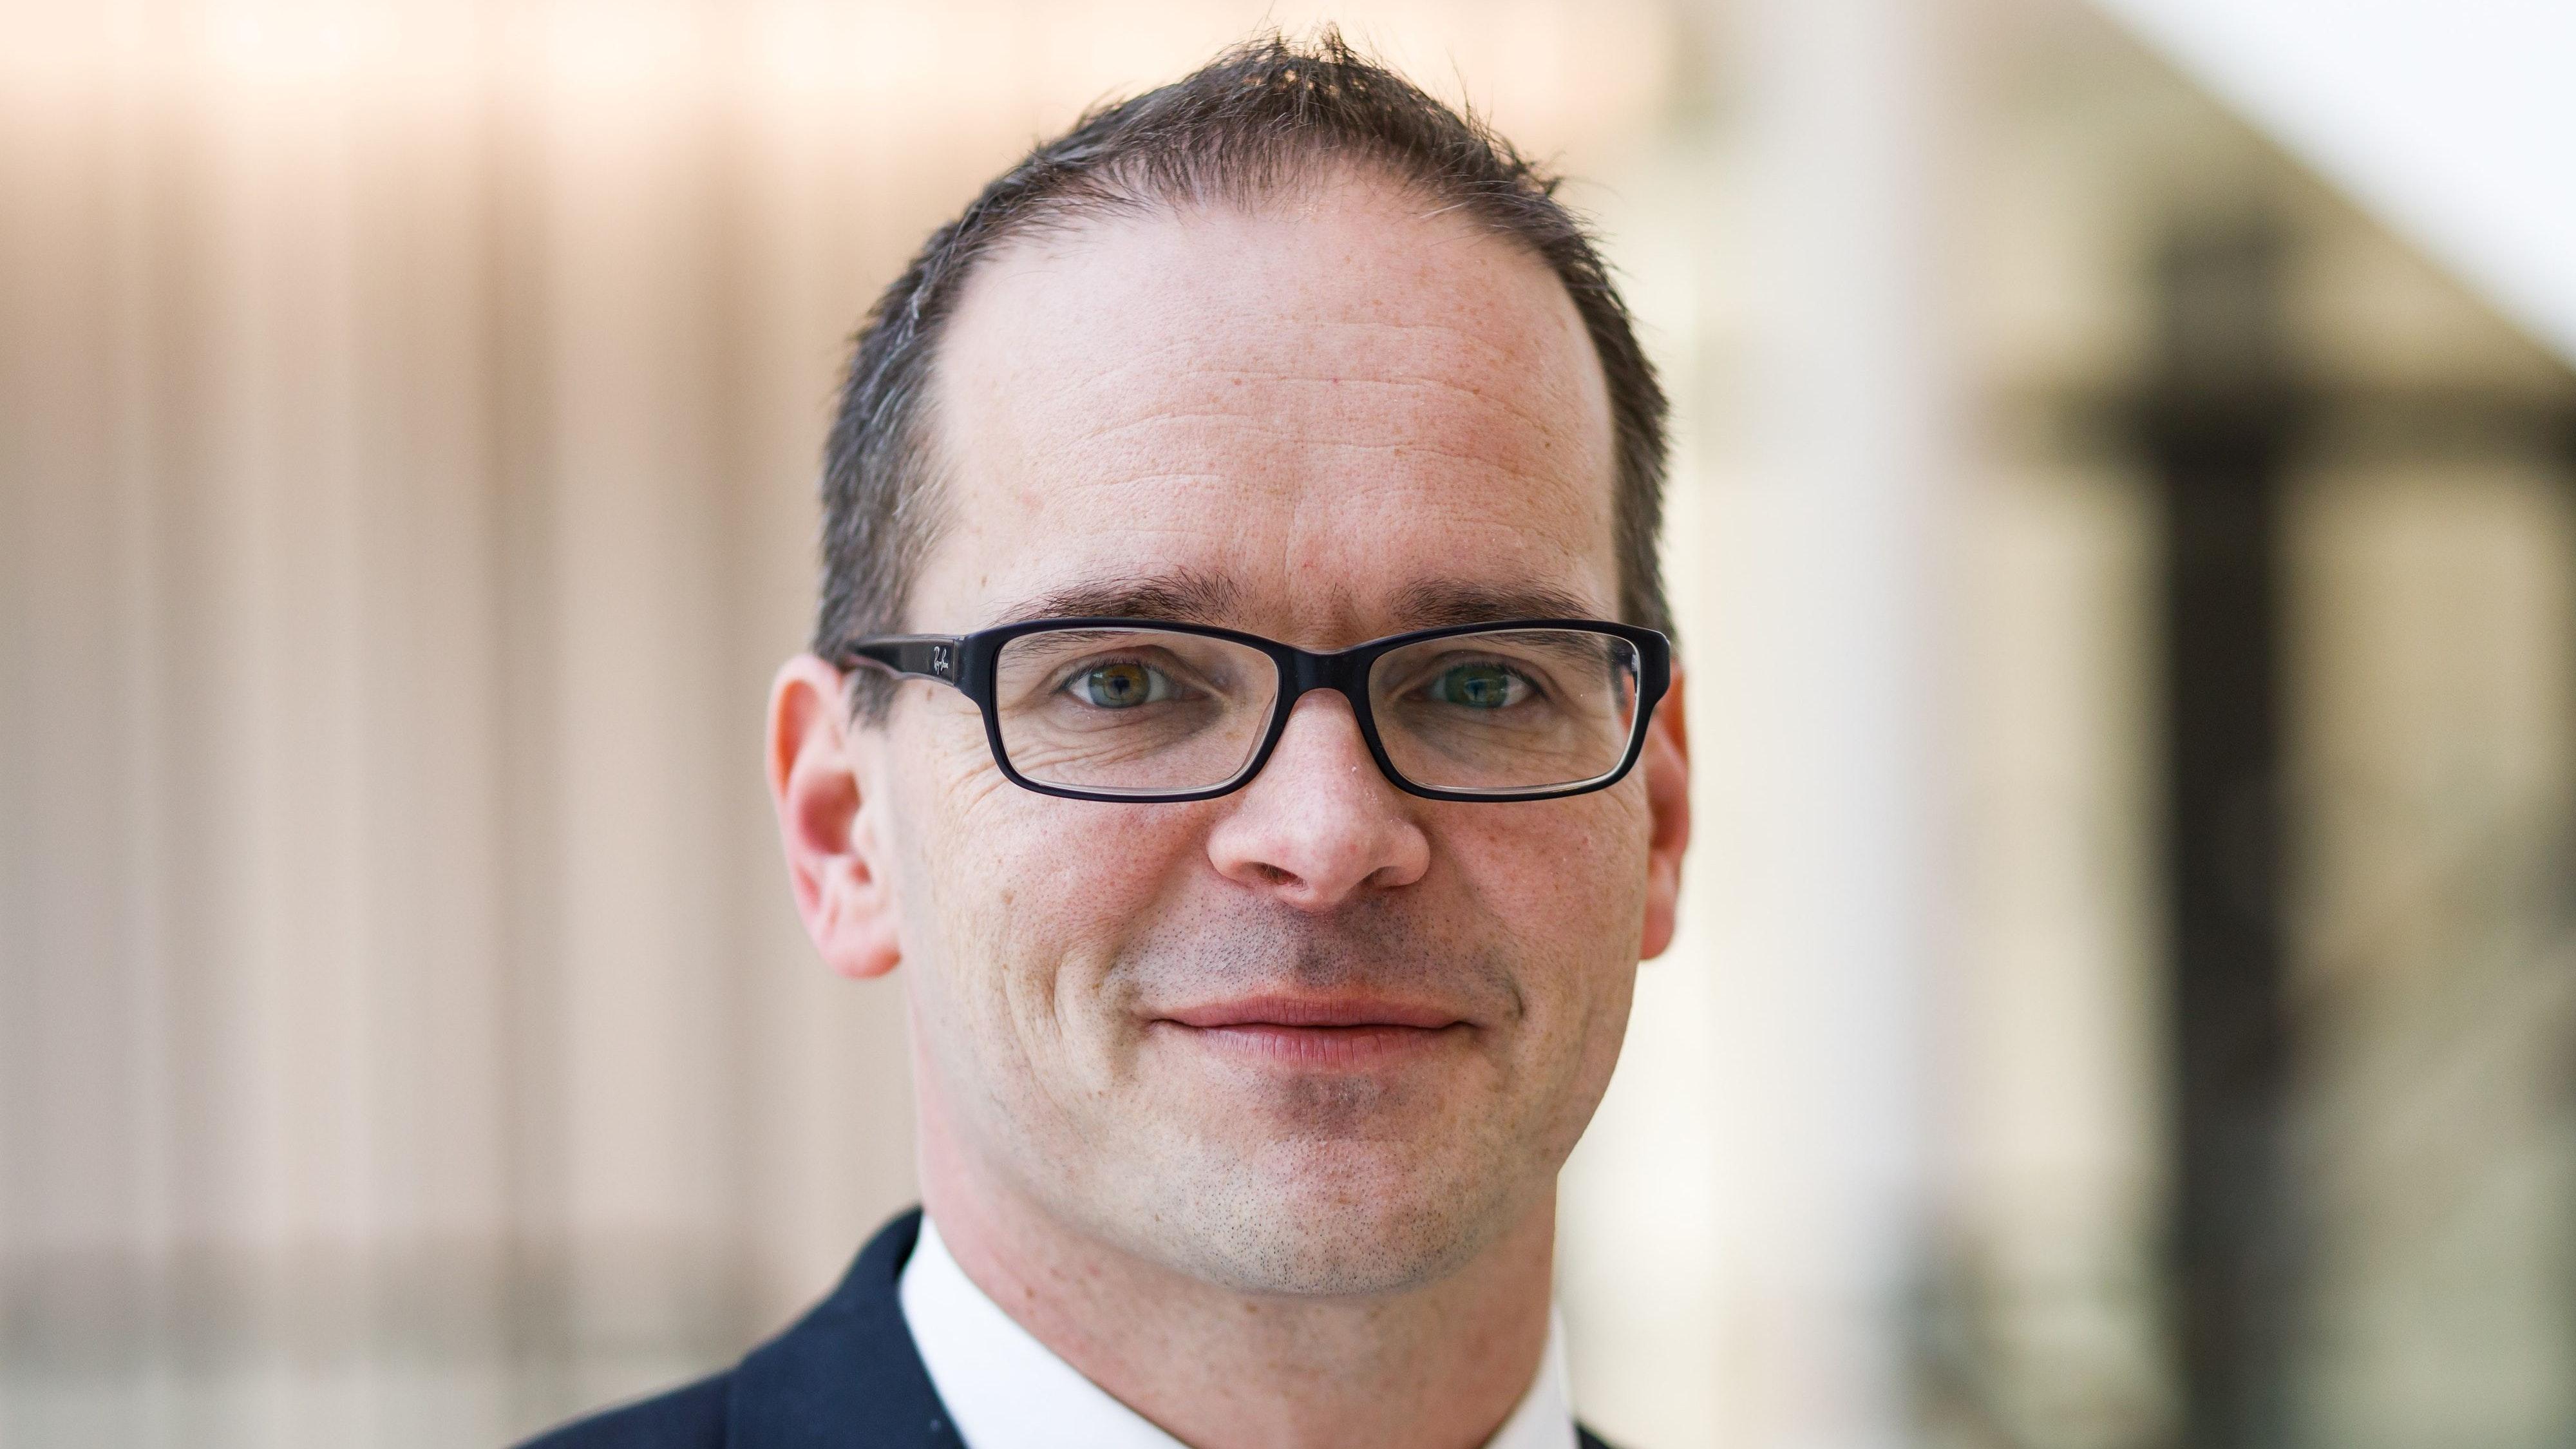 Niedersachsens Kultusminister Grant Hendrik Tonne (SPD). Foto: dpa/von Ditfurth